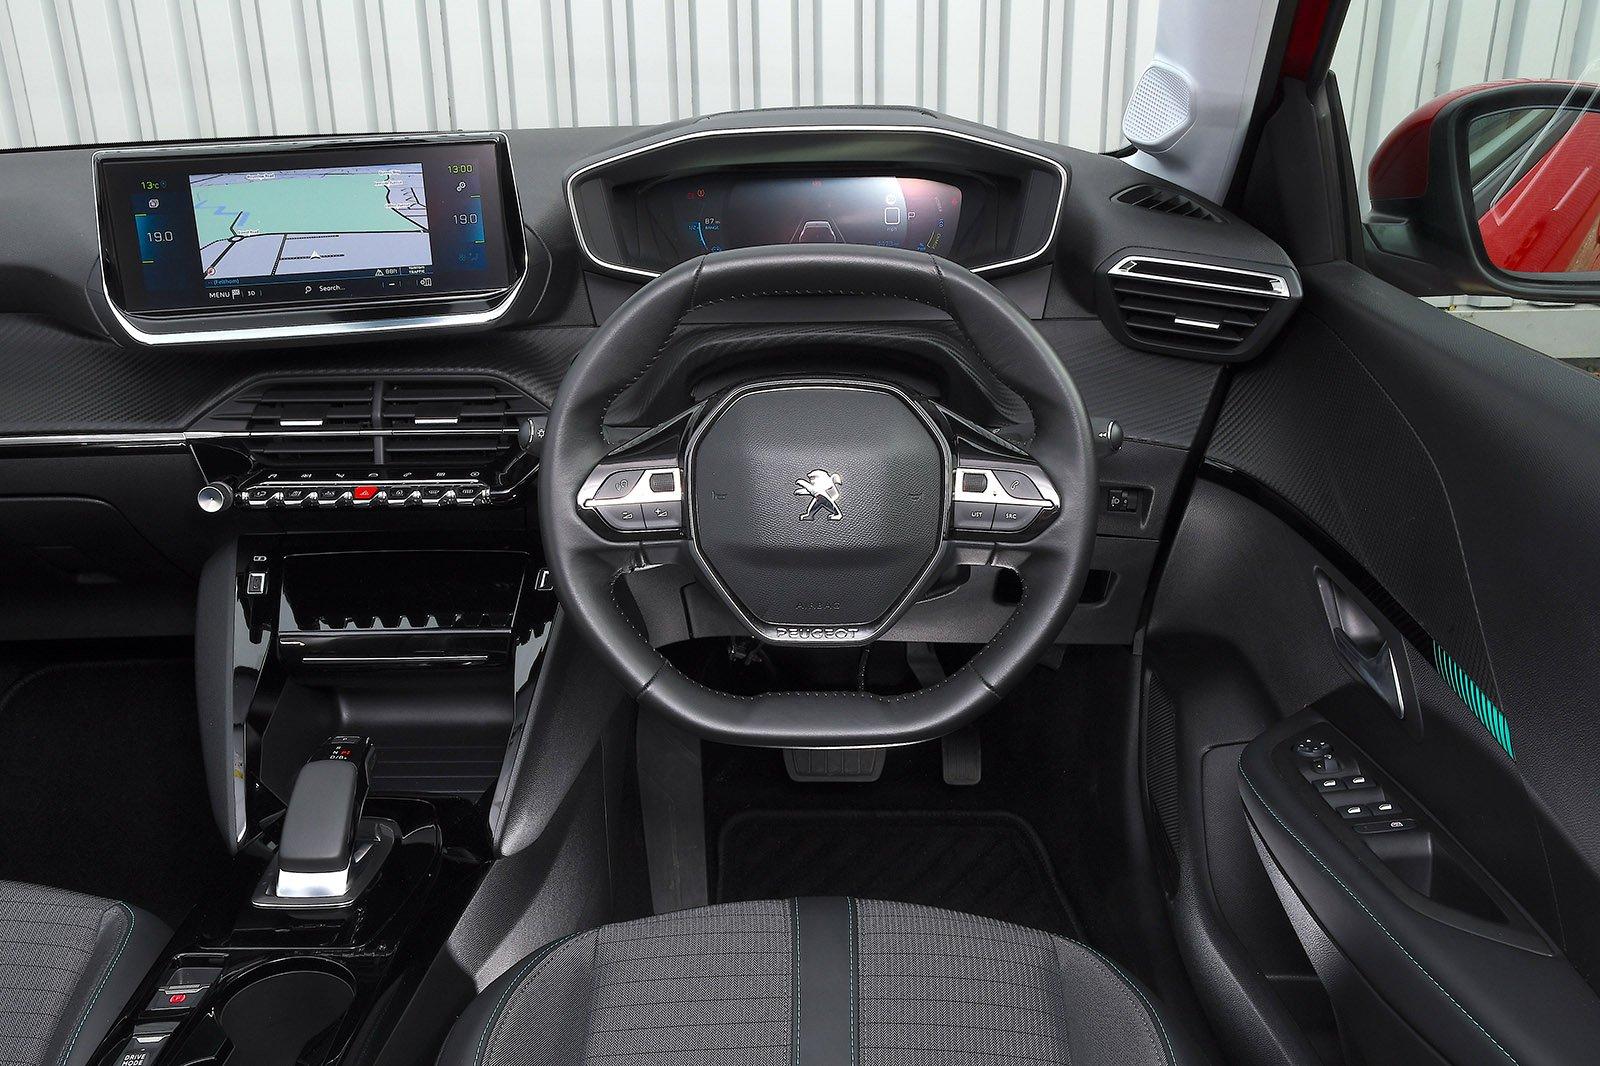 Peugeot e-208 2021 RHD dashboard